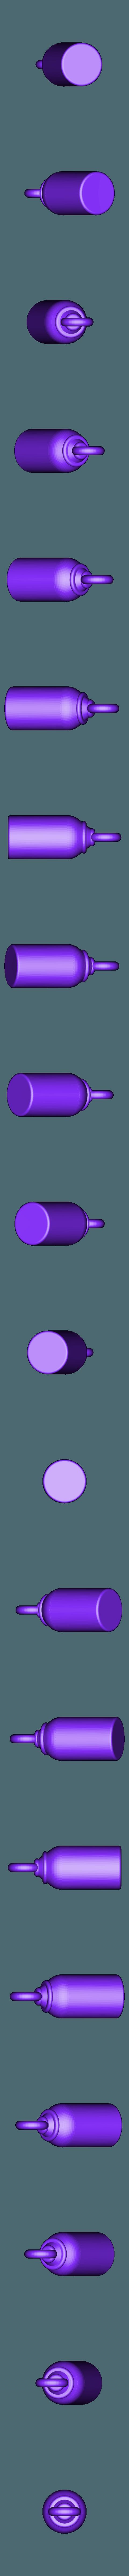 flaoting keyfob v2.stl Télécharger fichier STL gratuit Floating Keyfob • Design pour impression 3D, dvilleneuve